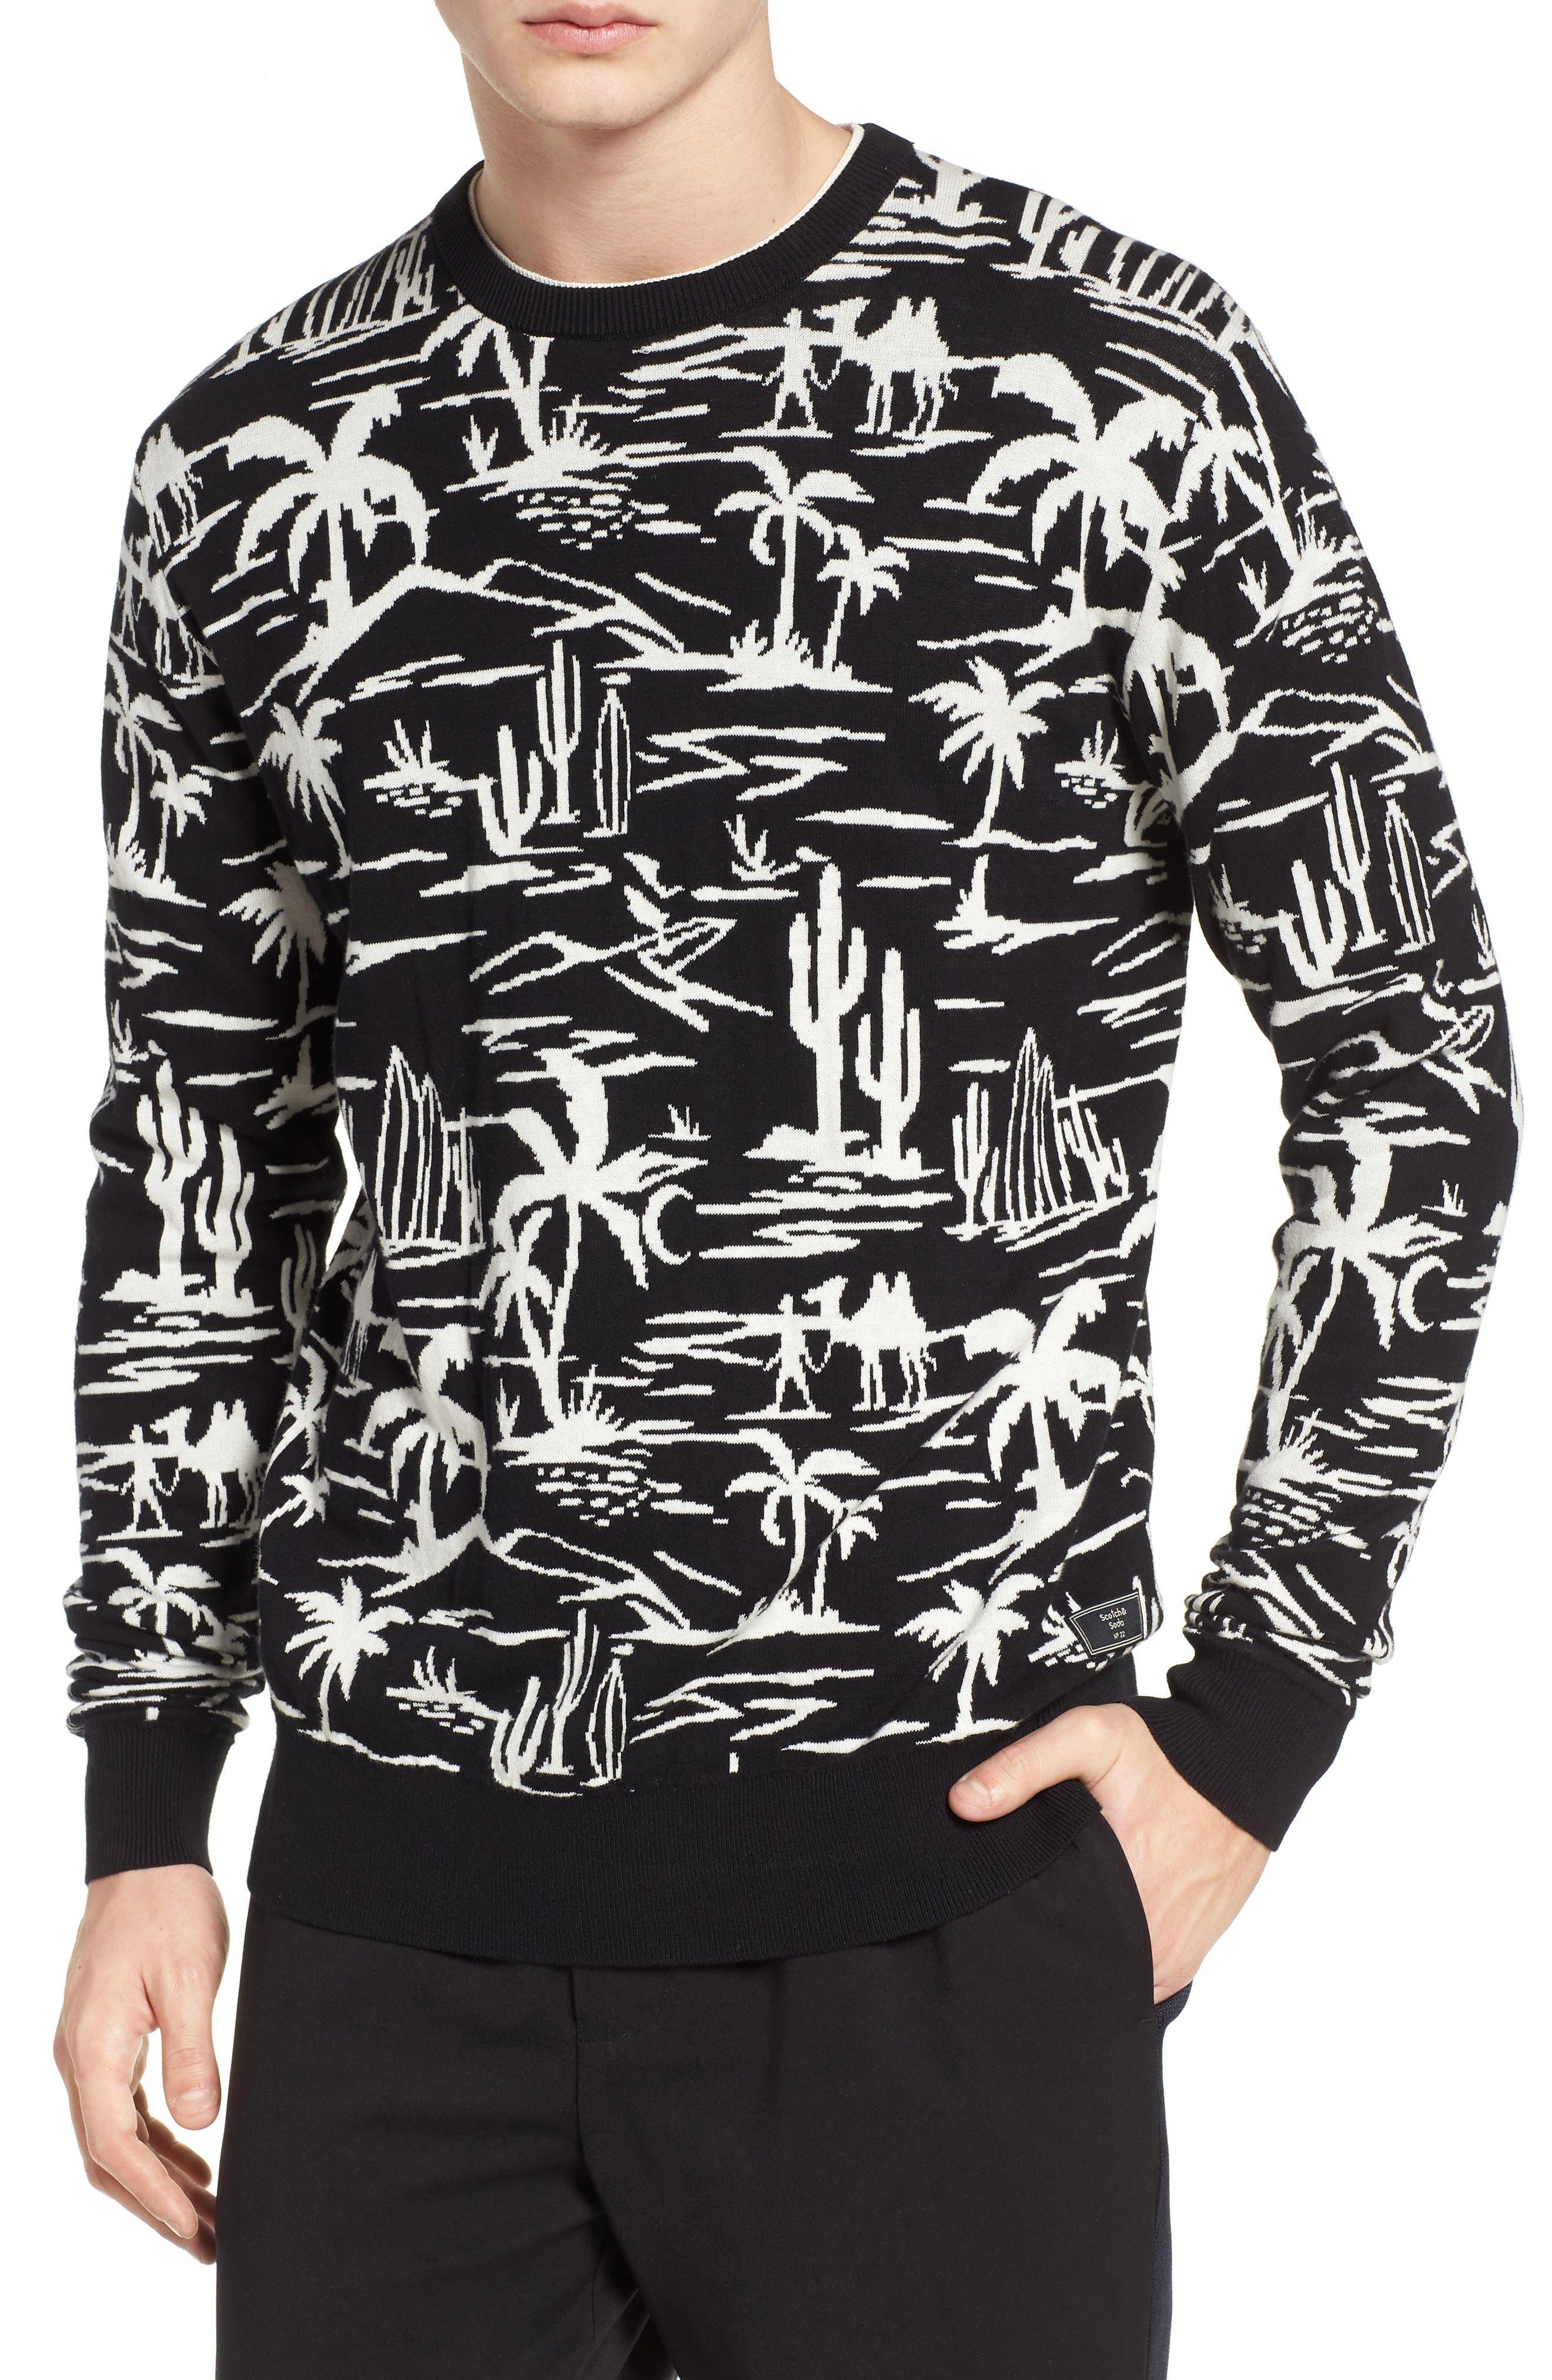 Jacquard Pattern Sweatshirt,                             Main thumbnail 1, color,                             002